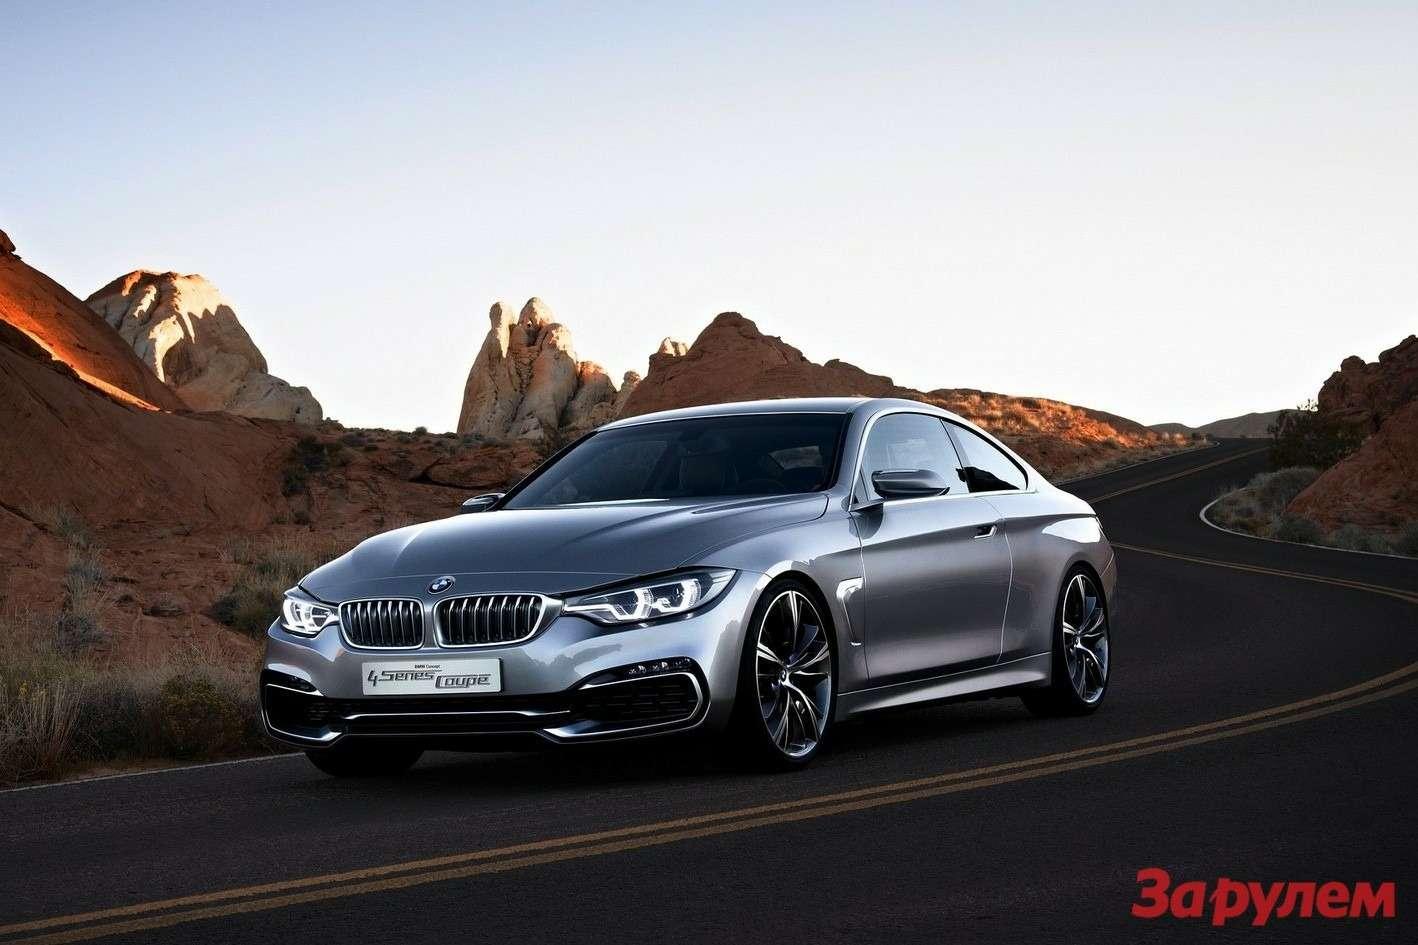 201212060954_bmw_4_series_coupe_concept_2013_1600x1200no_copyright